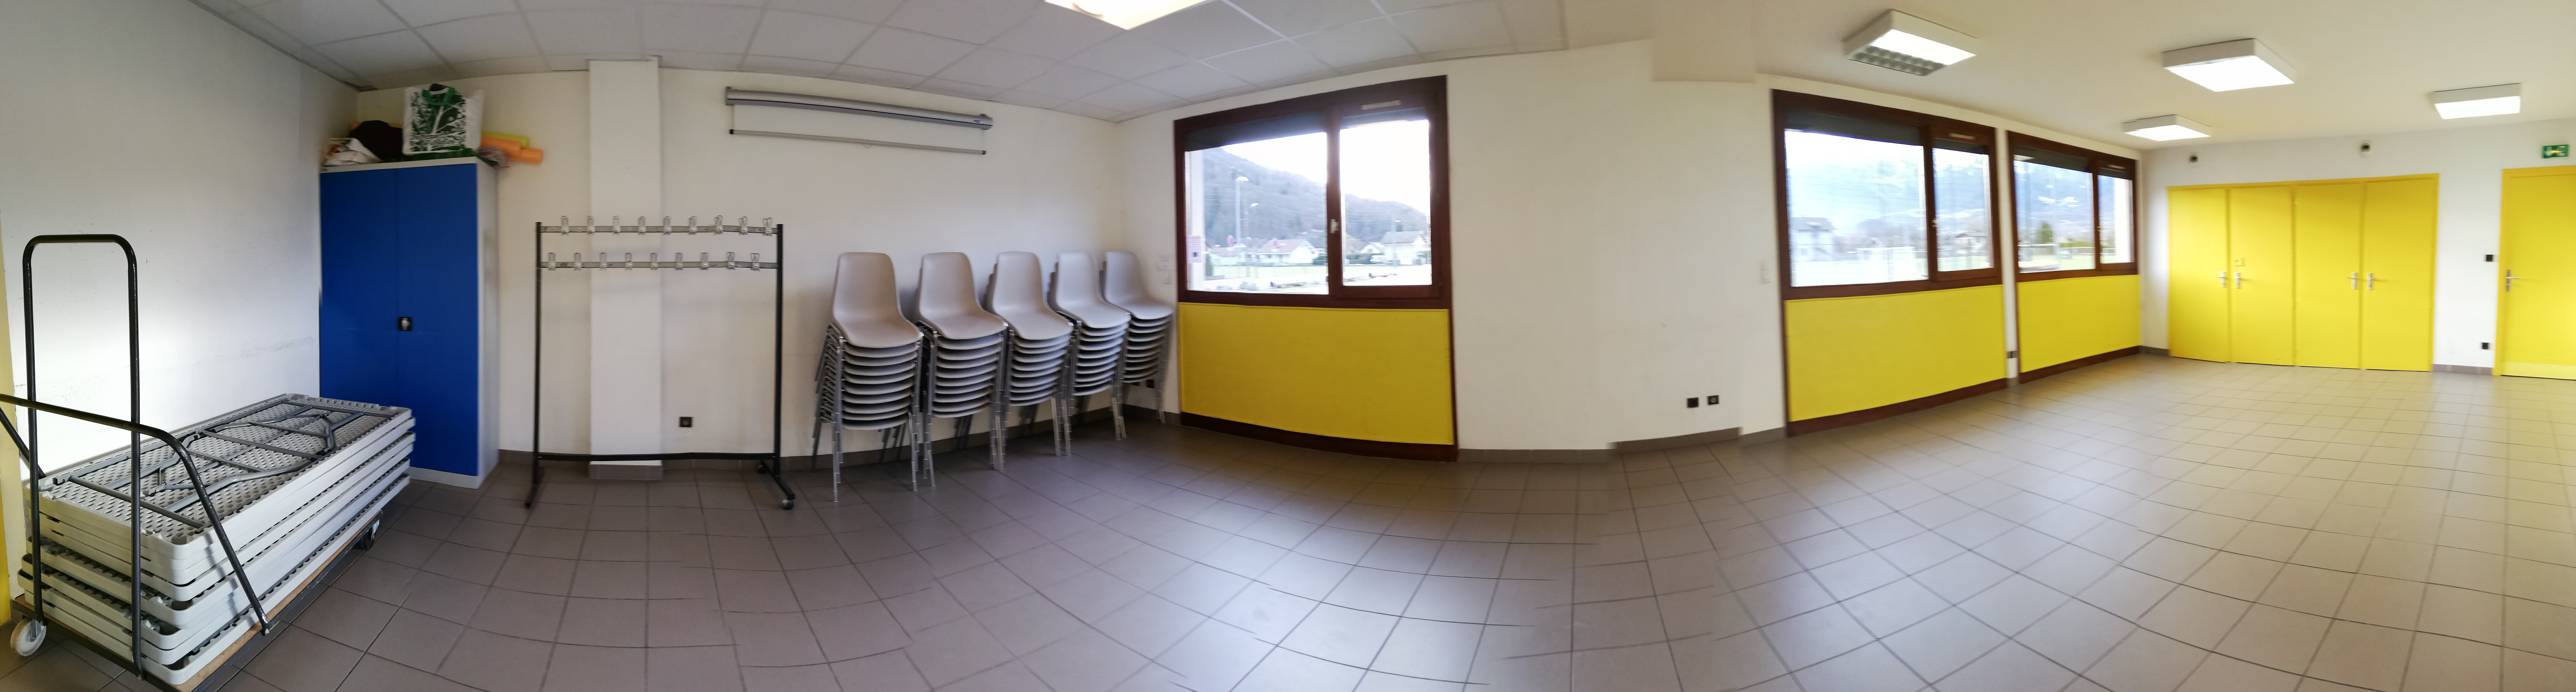 Petite Salle Po.jpg